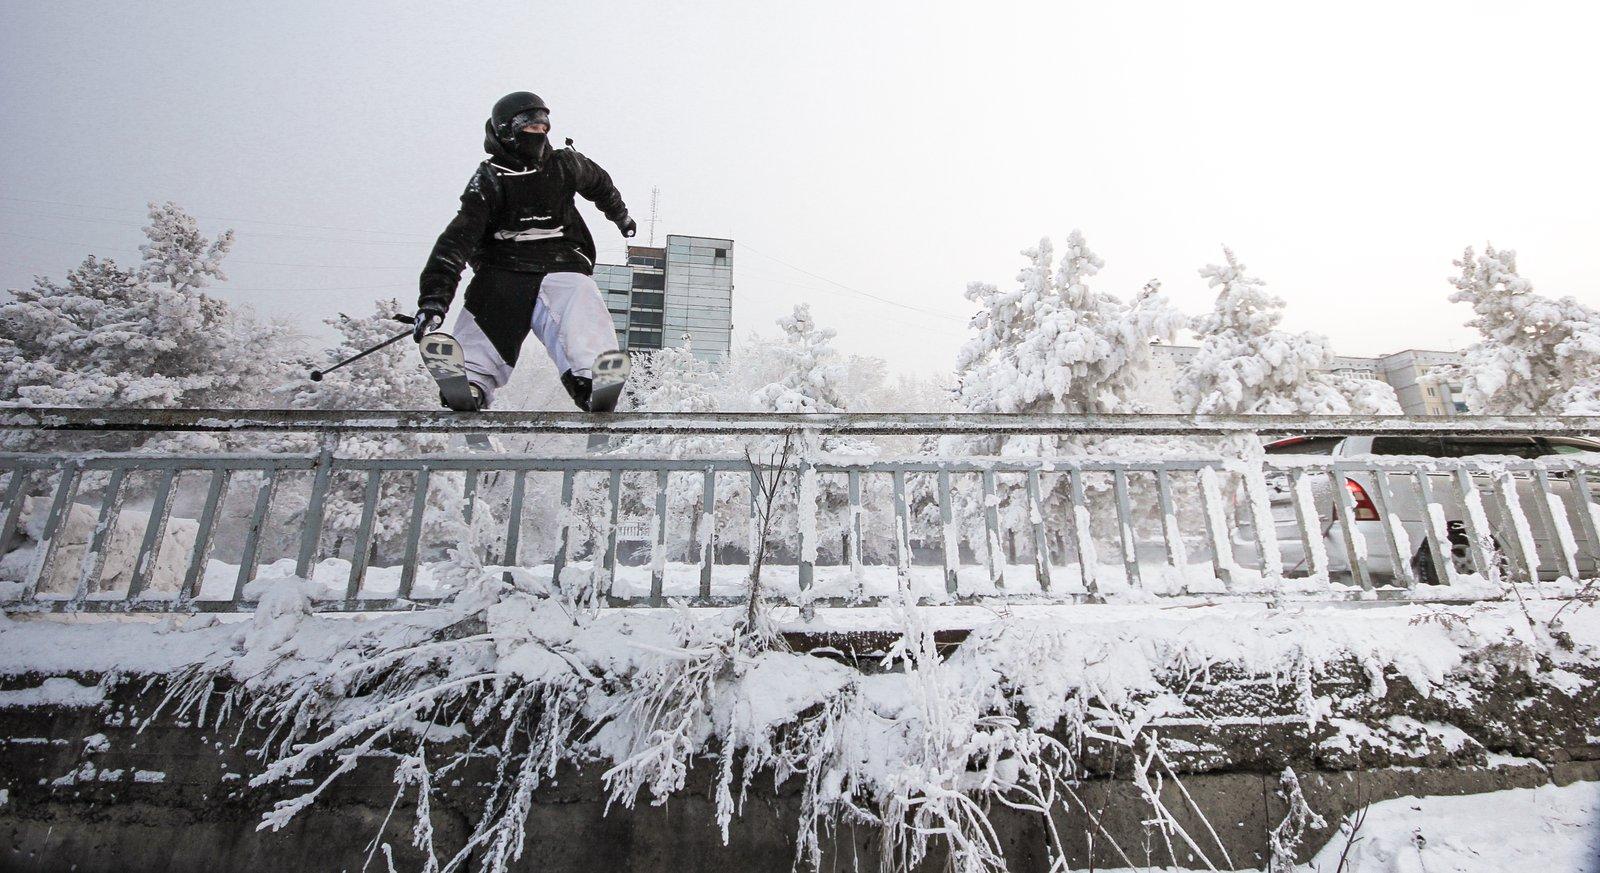 Russian winter!